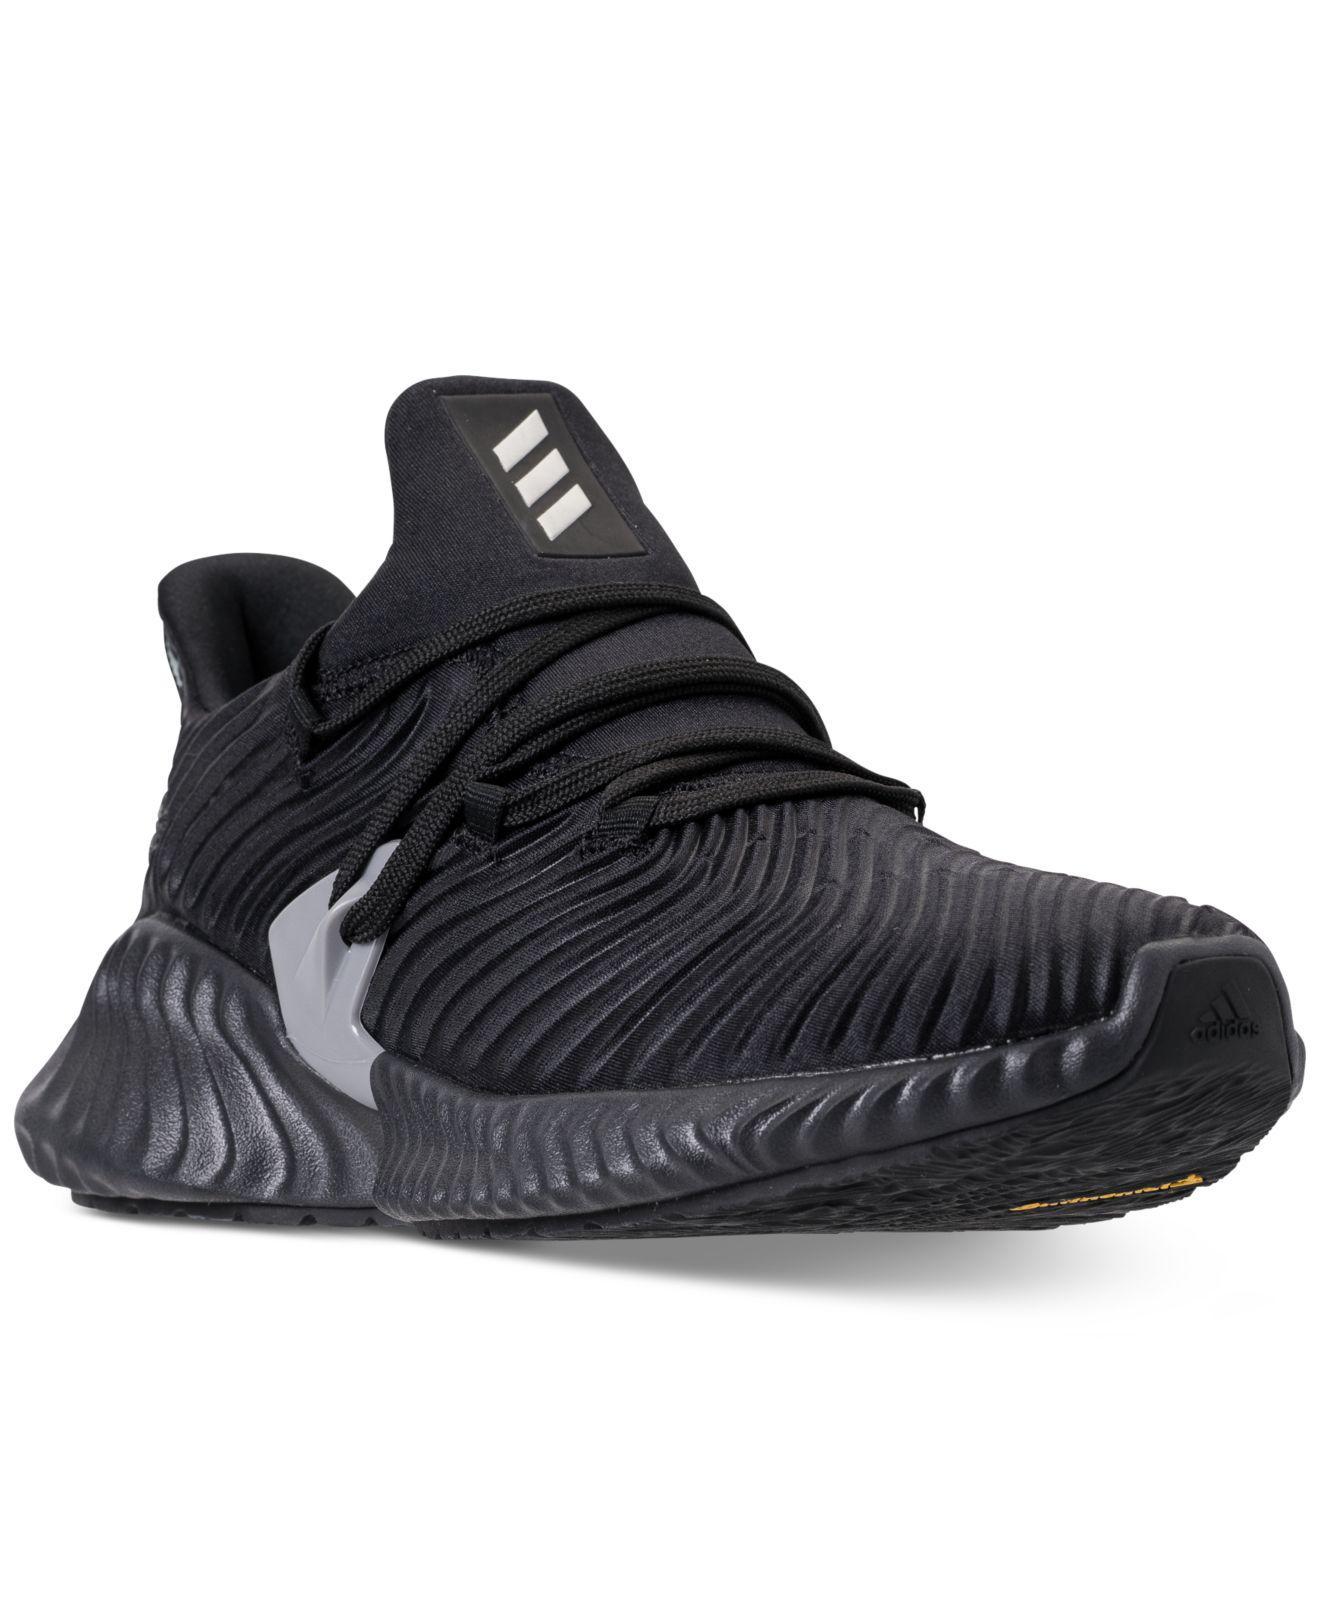 info for 5d9ca bd310 adidas. Womens Black Alphabounce Instinct ...